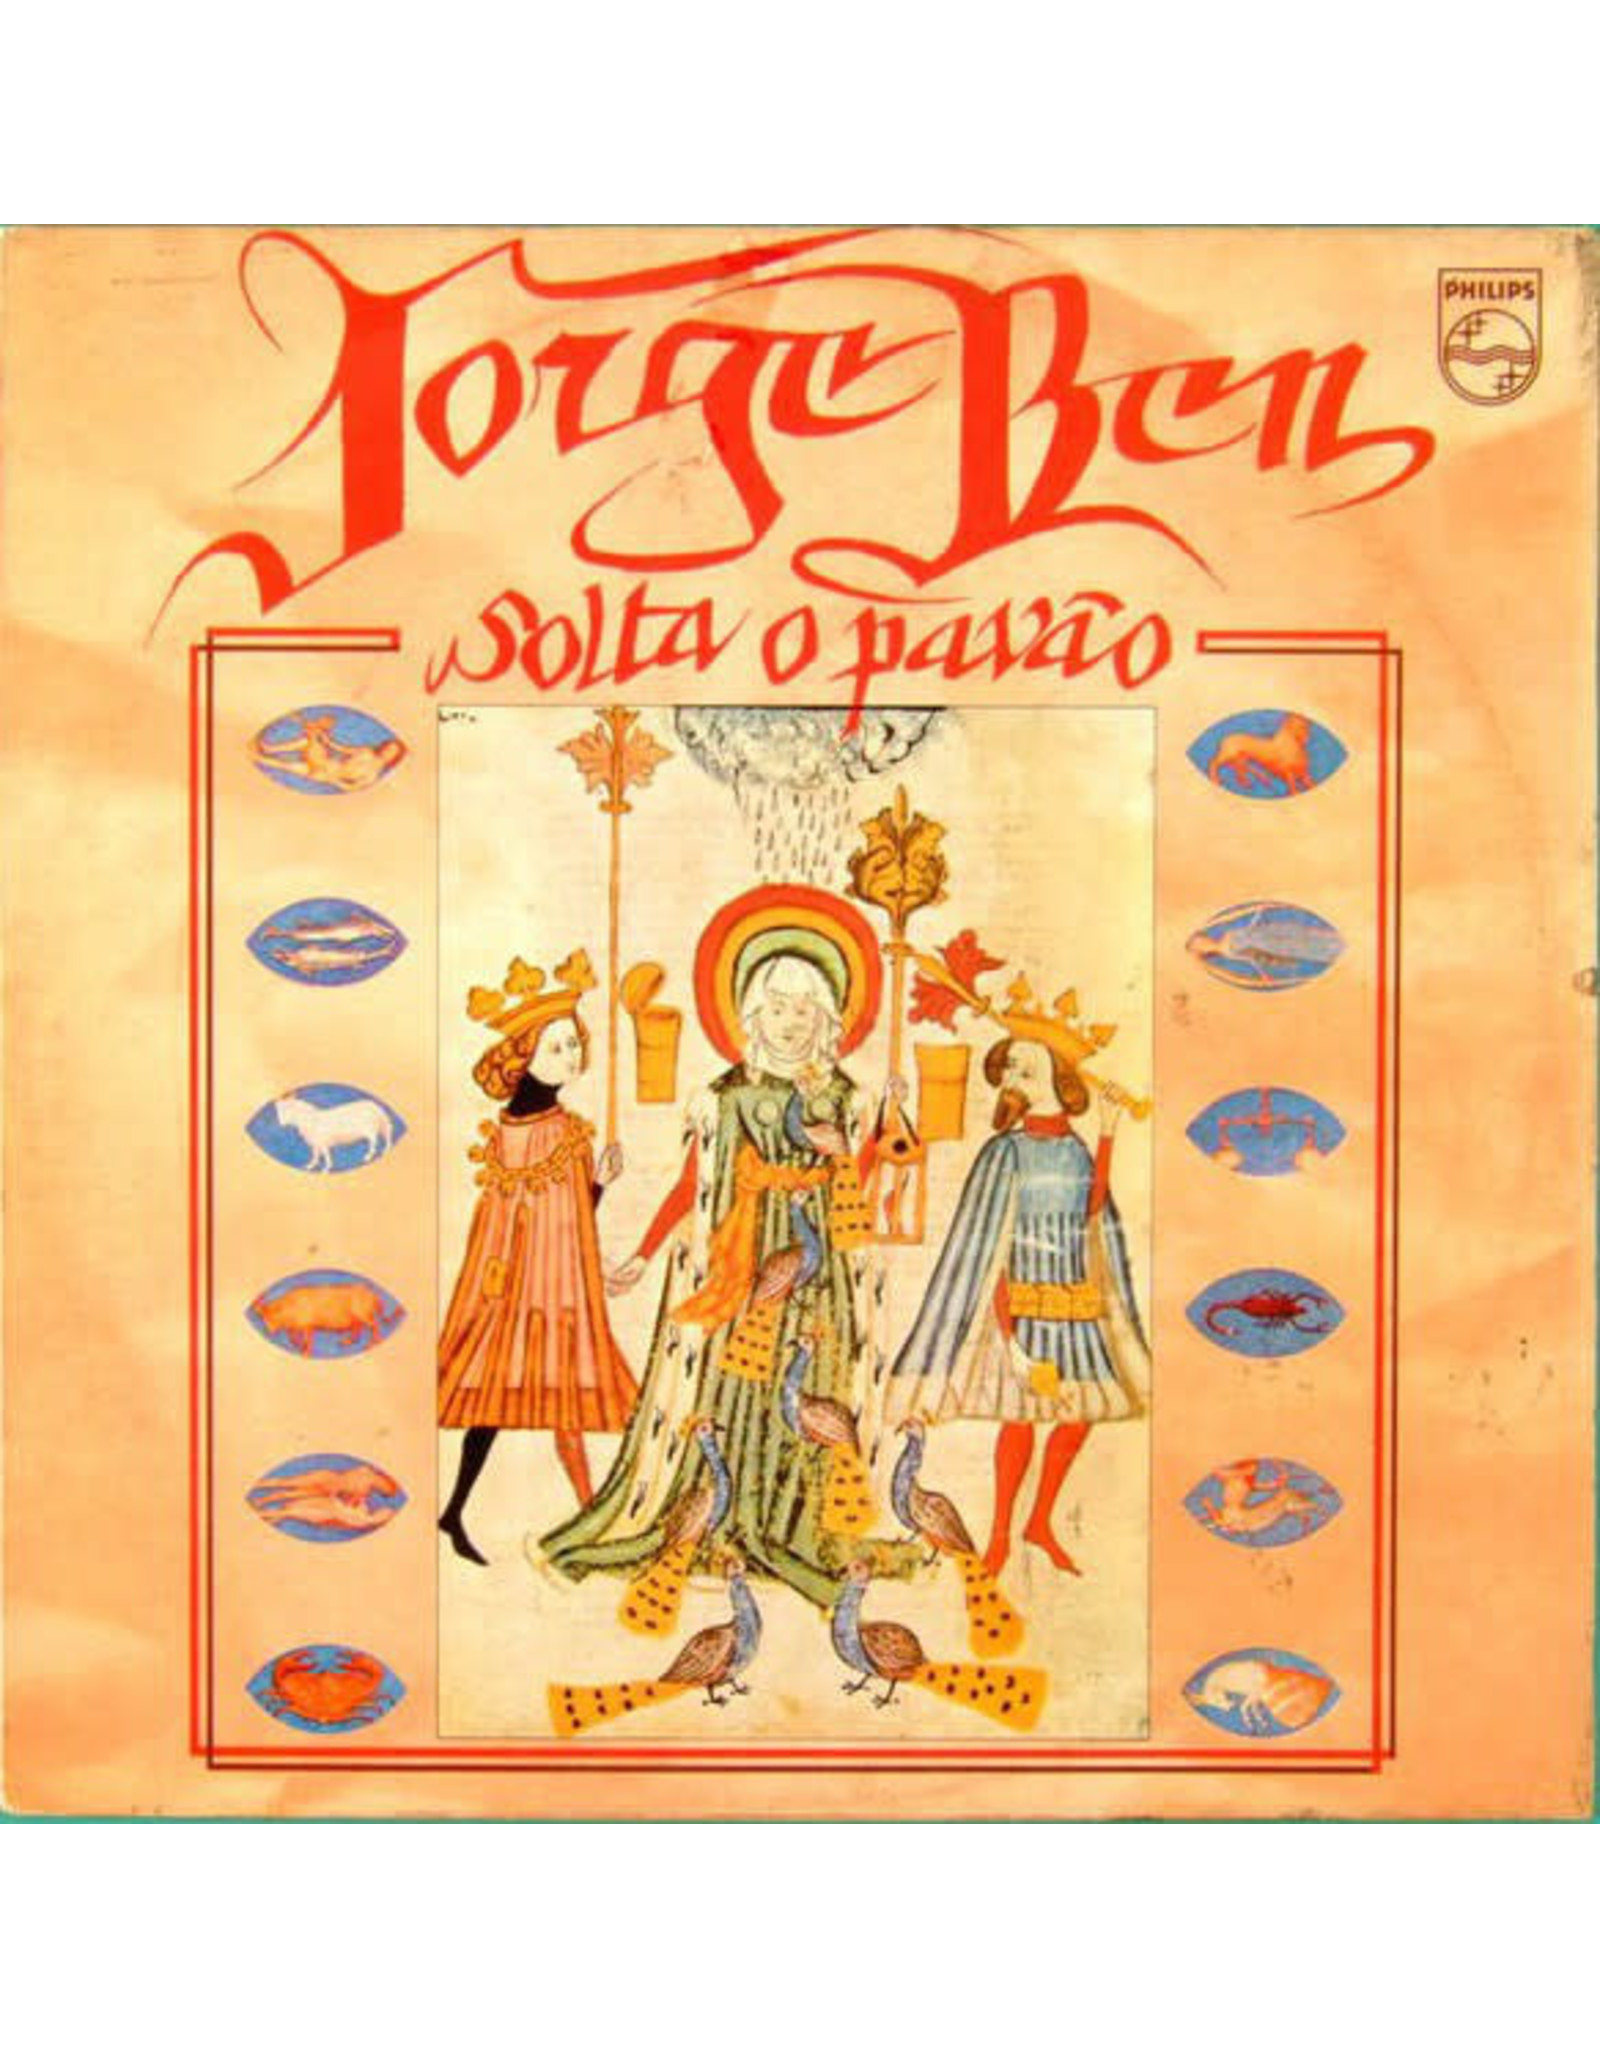 New Vinyl Jorge Ben - Solta O Pavao LP